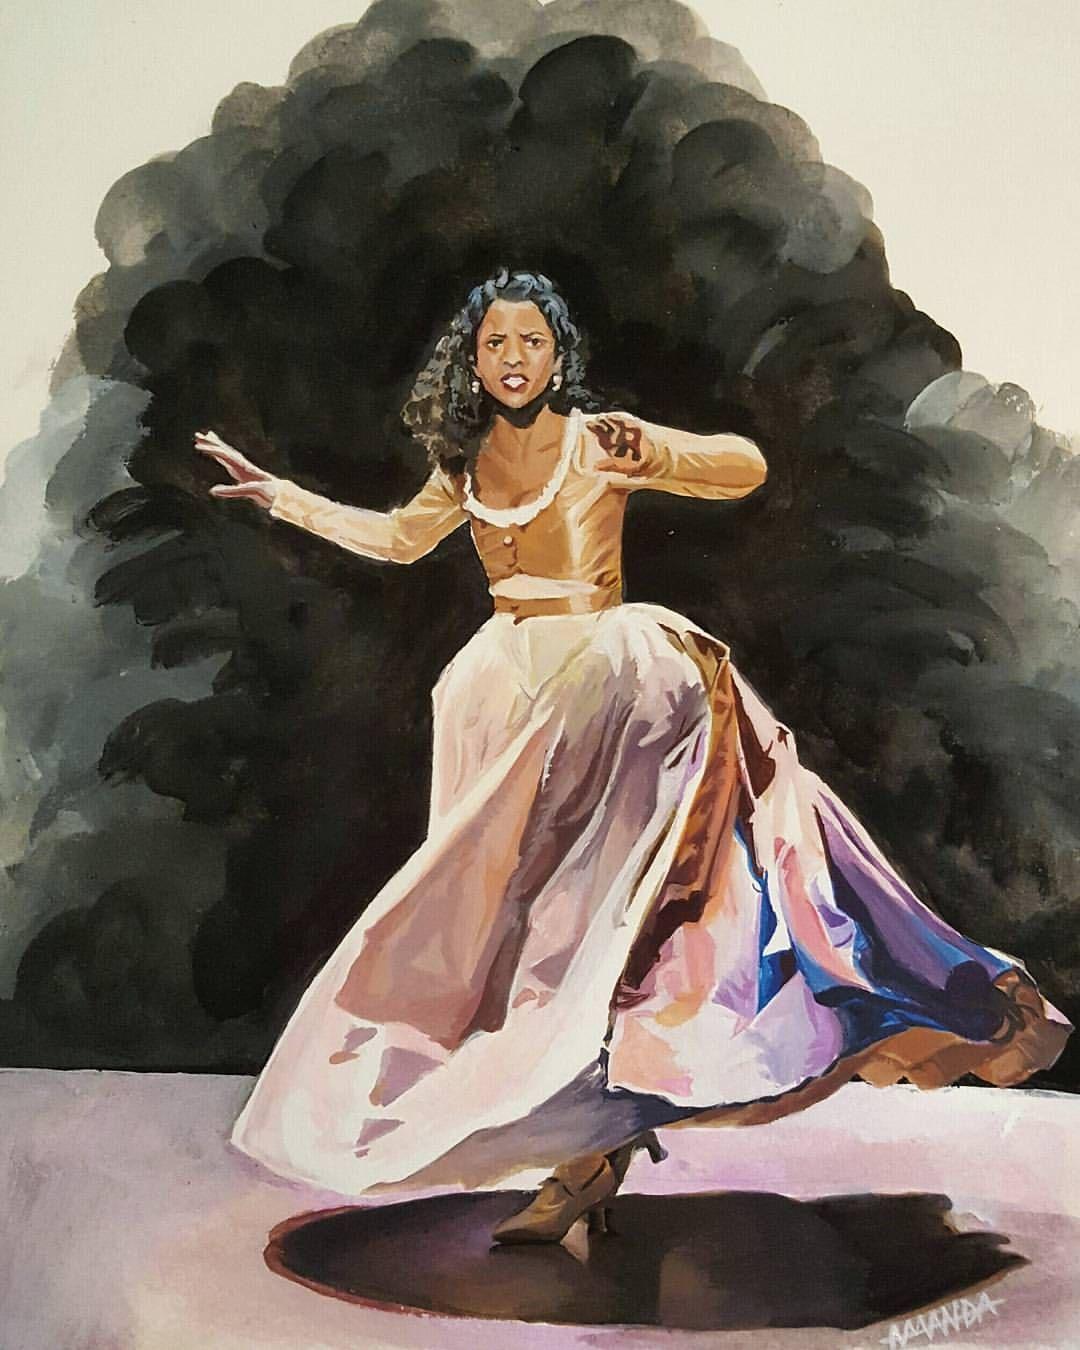 Angelica Schuyler As Requested By Wtfimunicorn On Instagram Like A Month Ago Hamilton Musical Hamilton Fanart Hamilton Funny